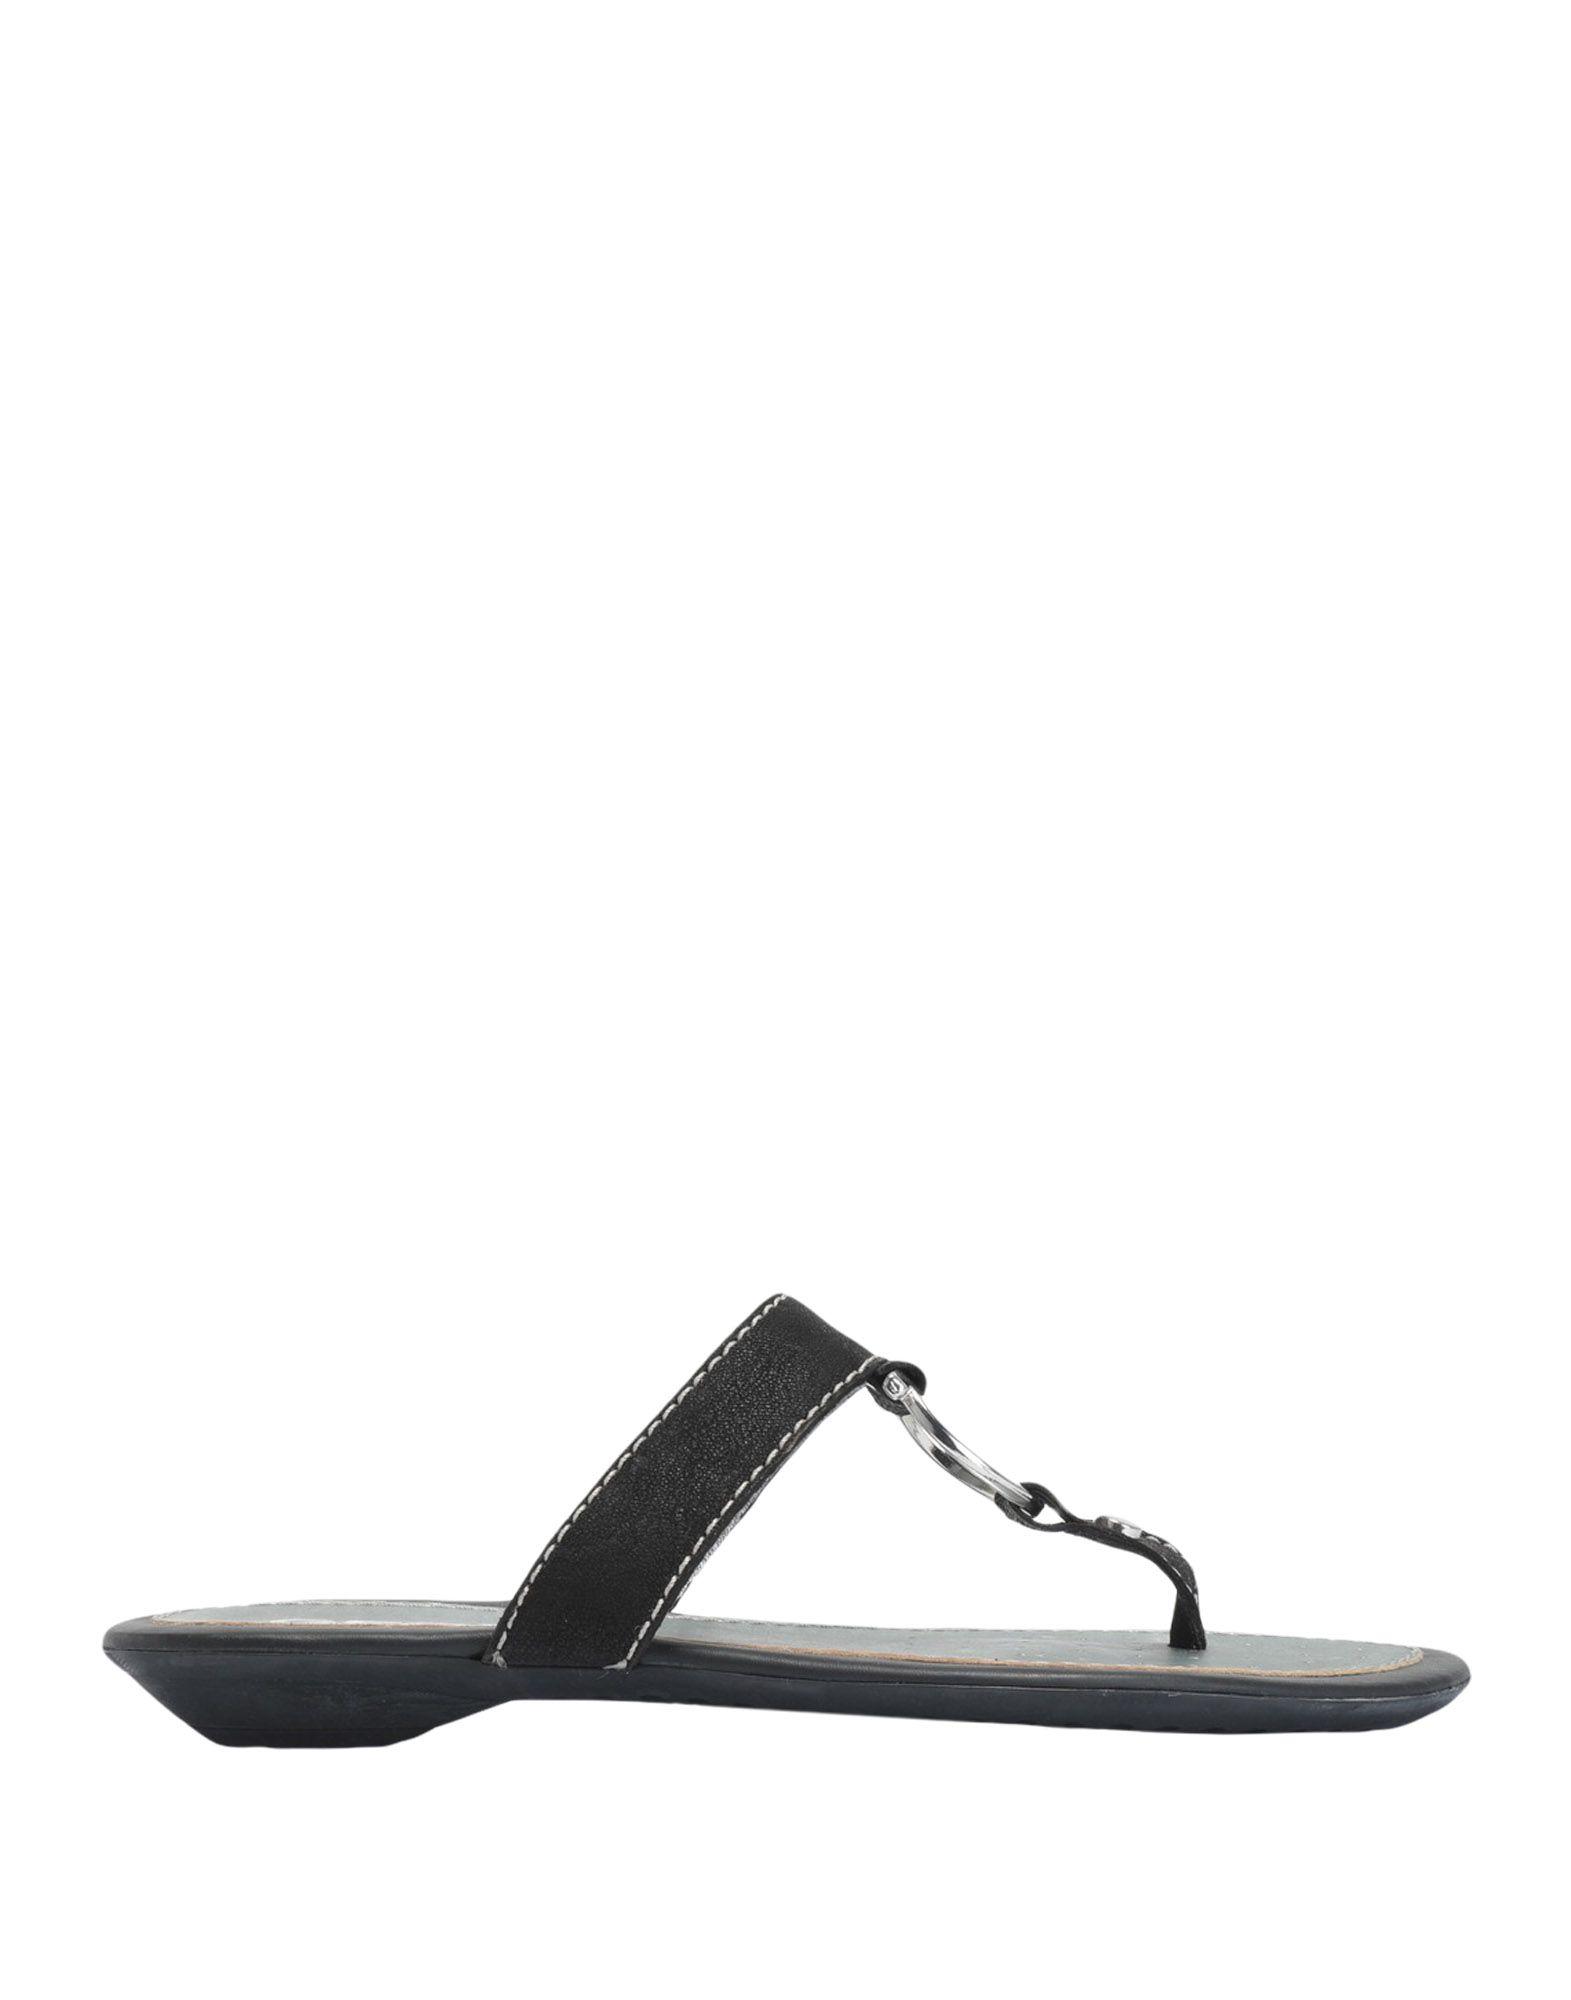 Geox Dianetten Damen  11530106HP Gute Qualität beliebte Schuhe